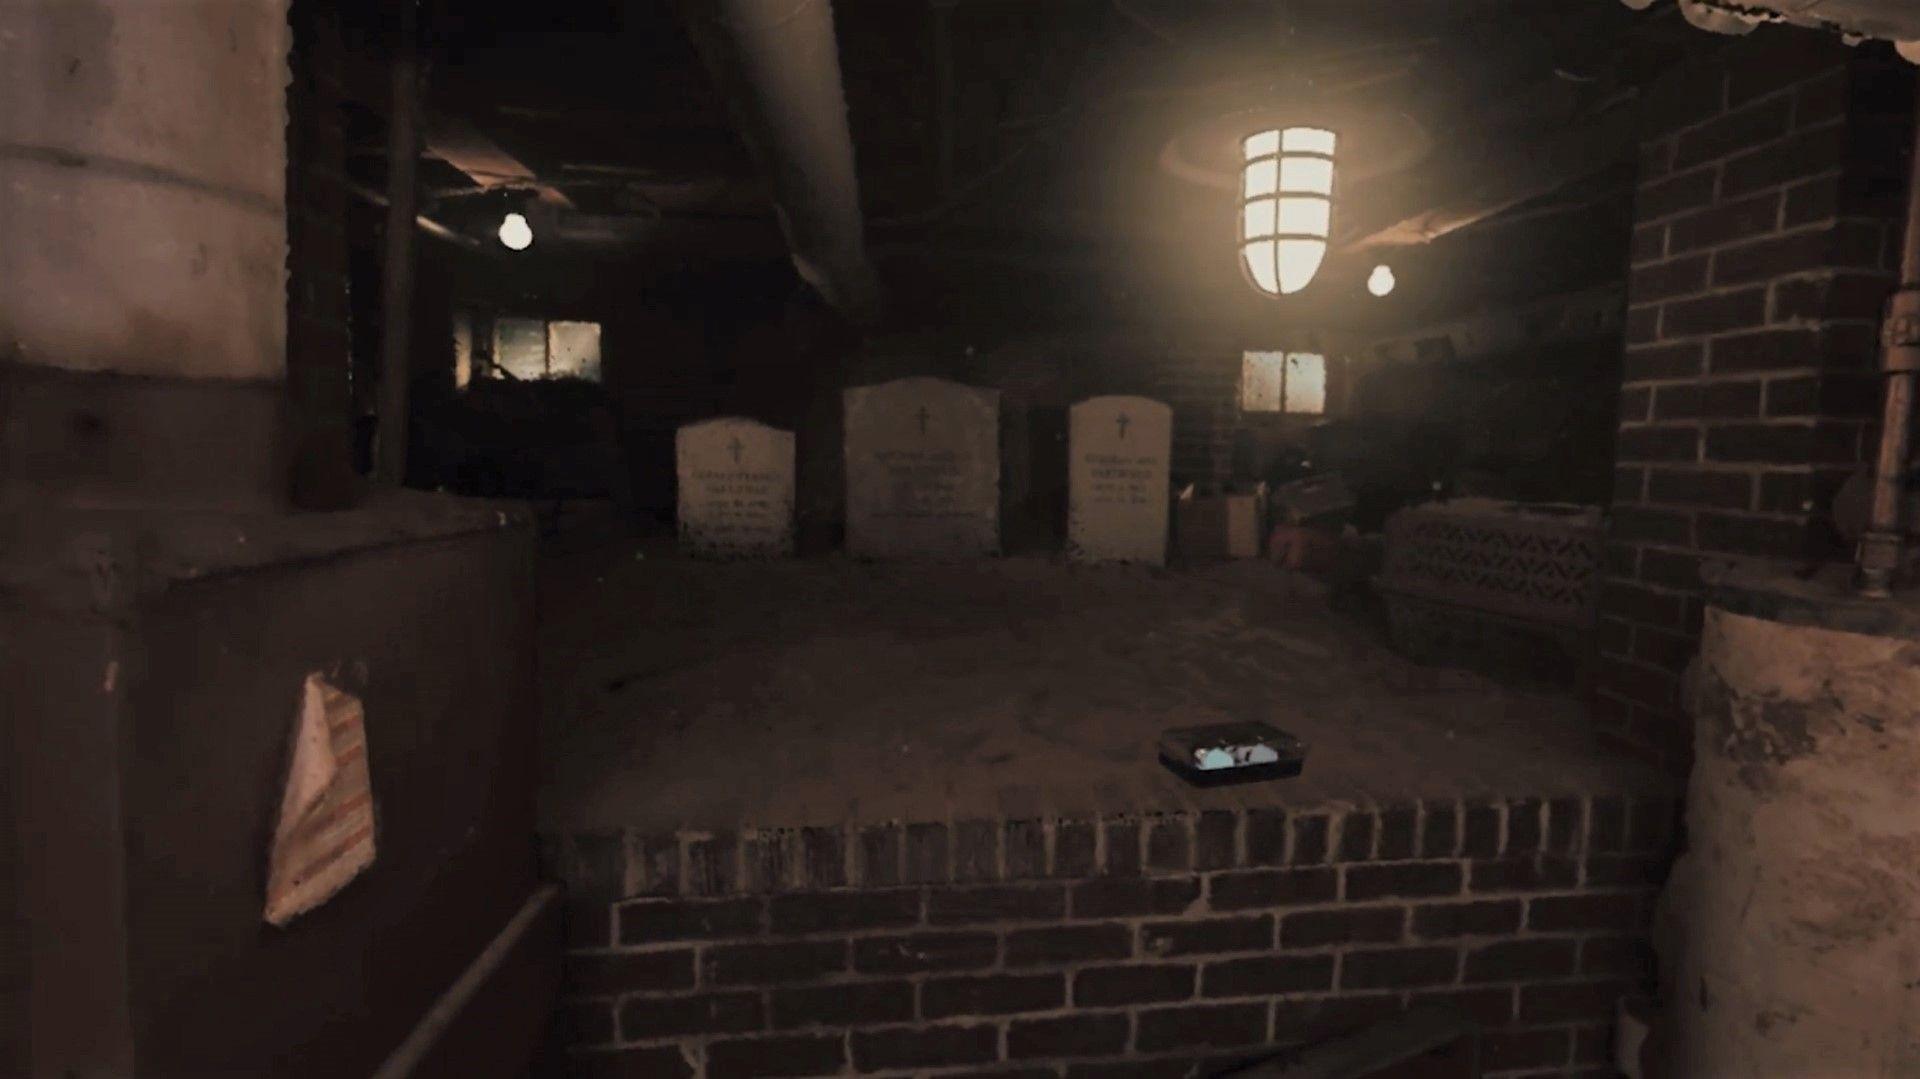 Mr Mercedes Vr Escape Room To Land On Htc Vive July 22nd